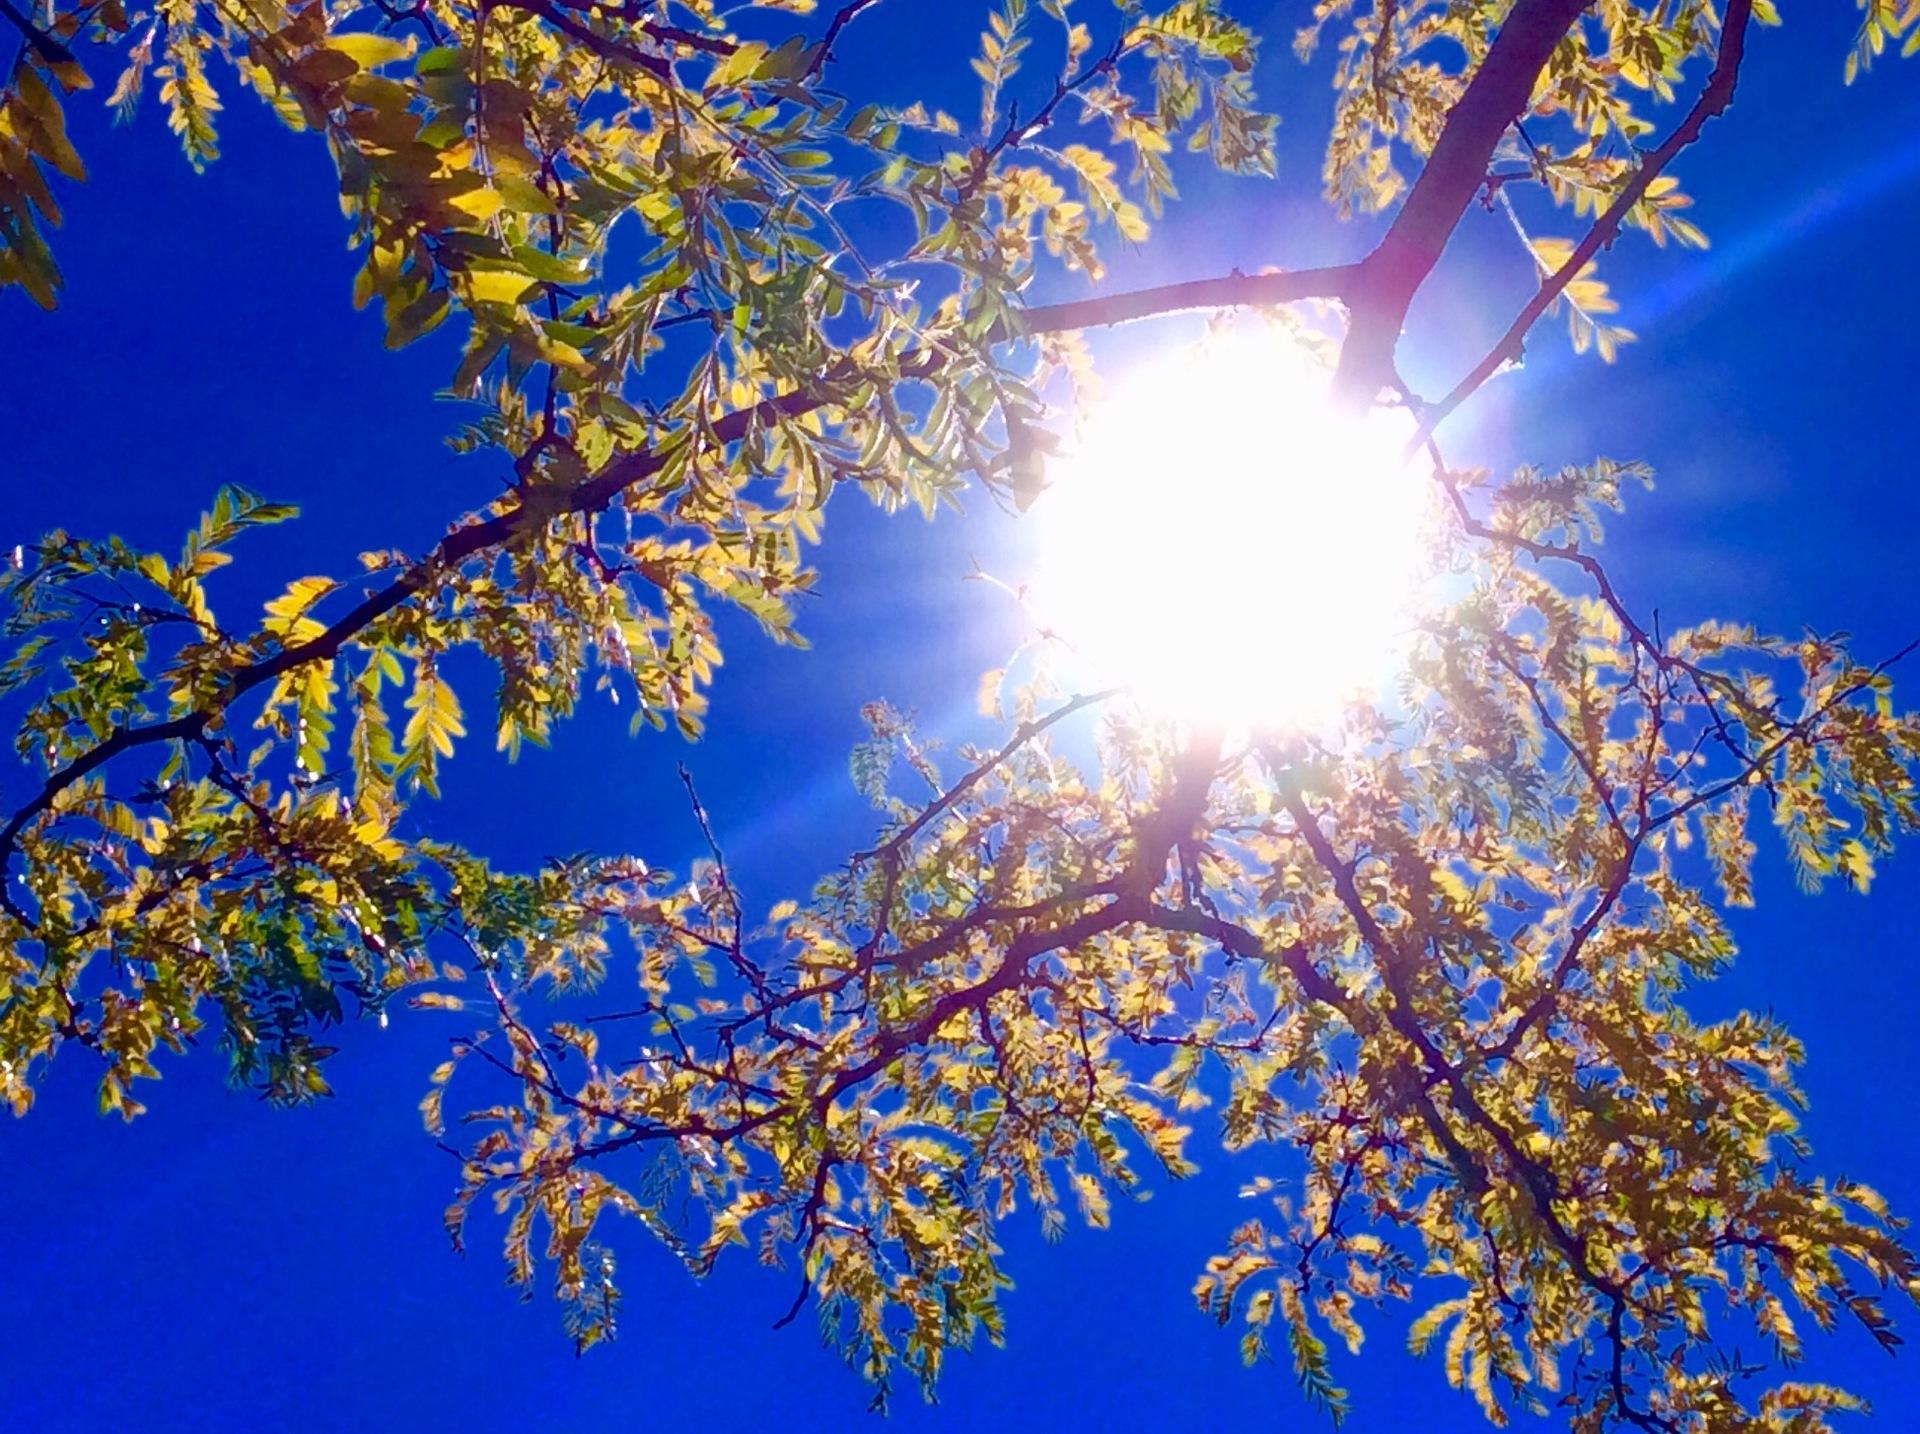 Autumn foliage  | drazpet, background, blue sky, branch